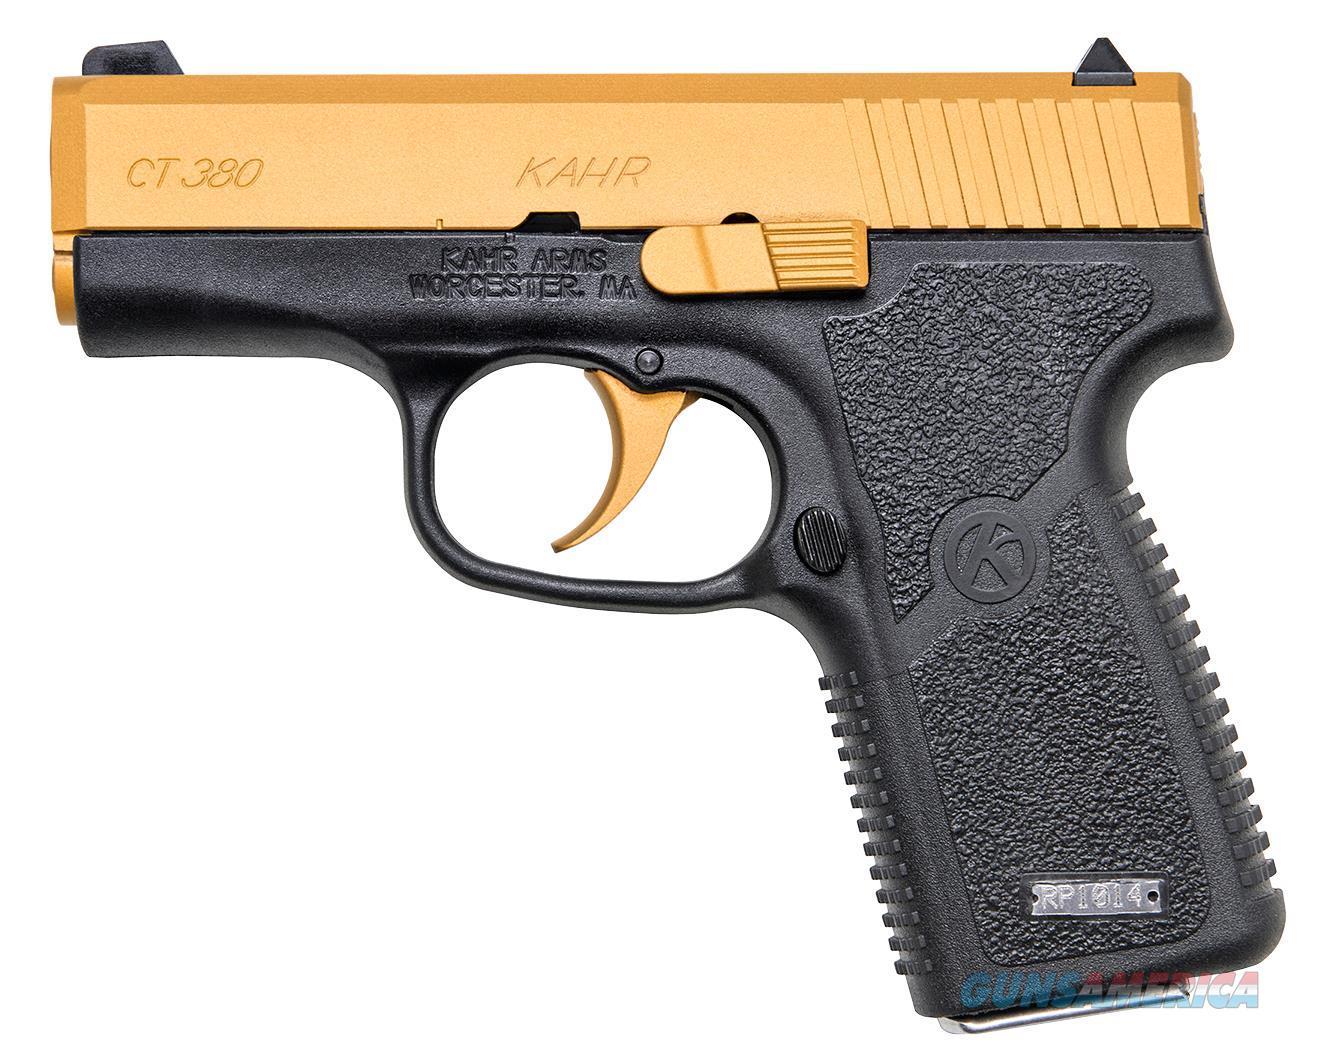 "Kahr Arms Ct3833cg Ct380 Gold Cerakote Dao 380 Acp 3"" 7+1 Black Polymer Grip/Frame Gold Cerakote CT3833CG  Guns > Pistols > K Misc Pistols"